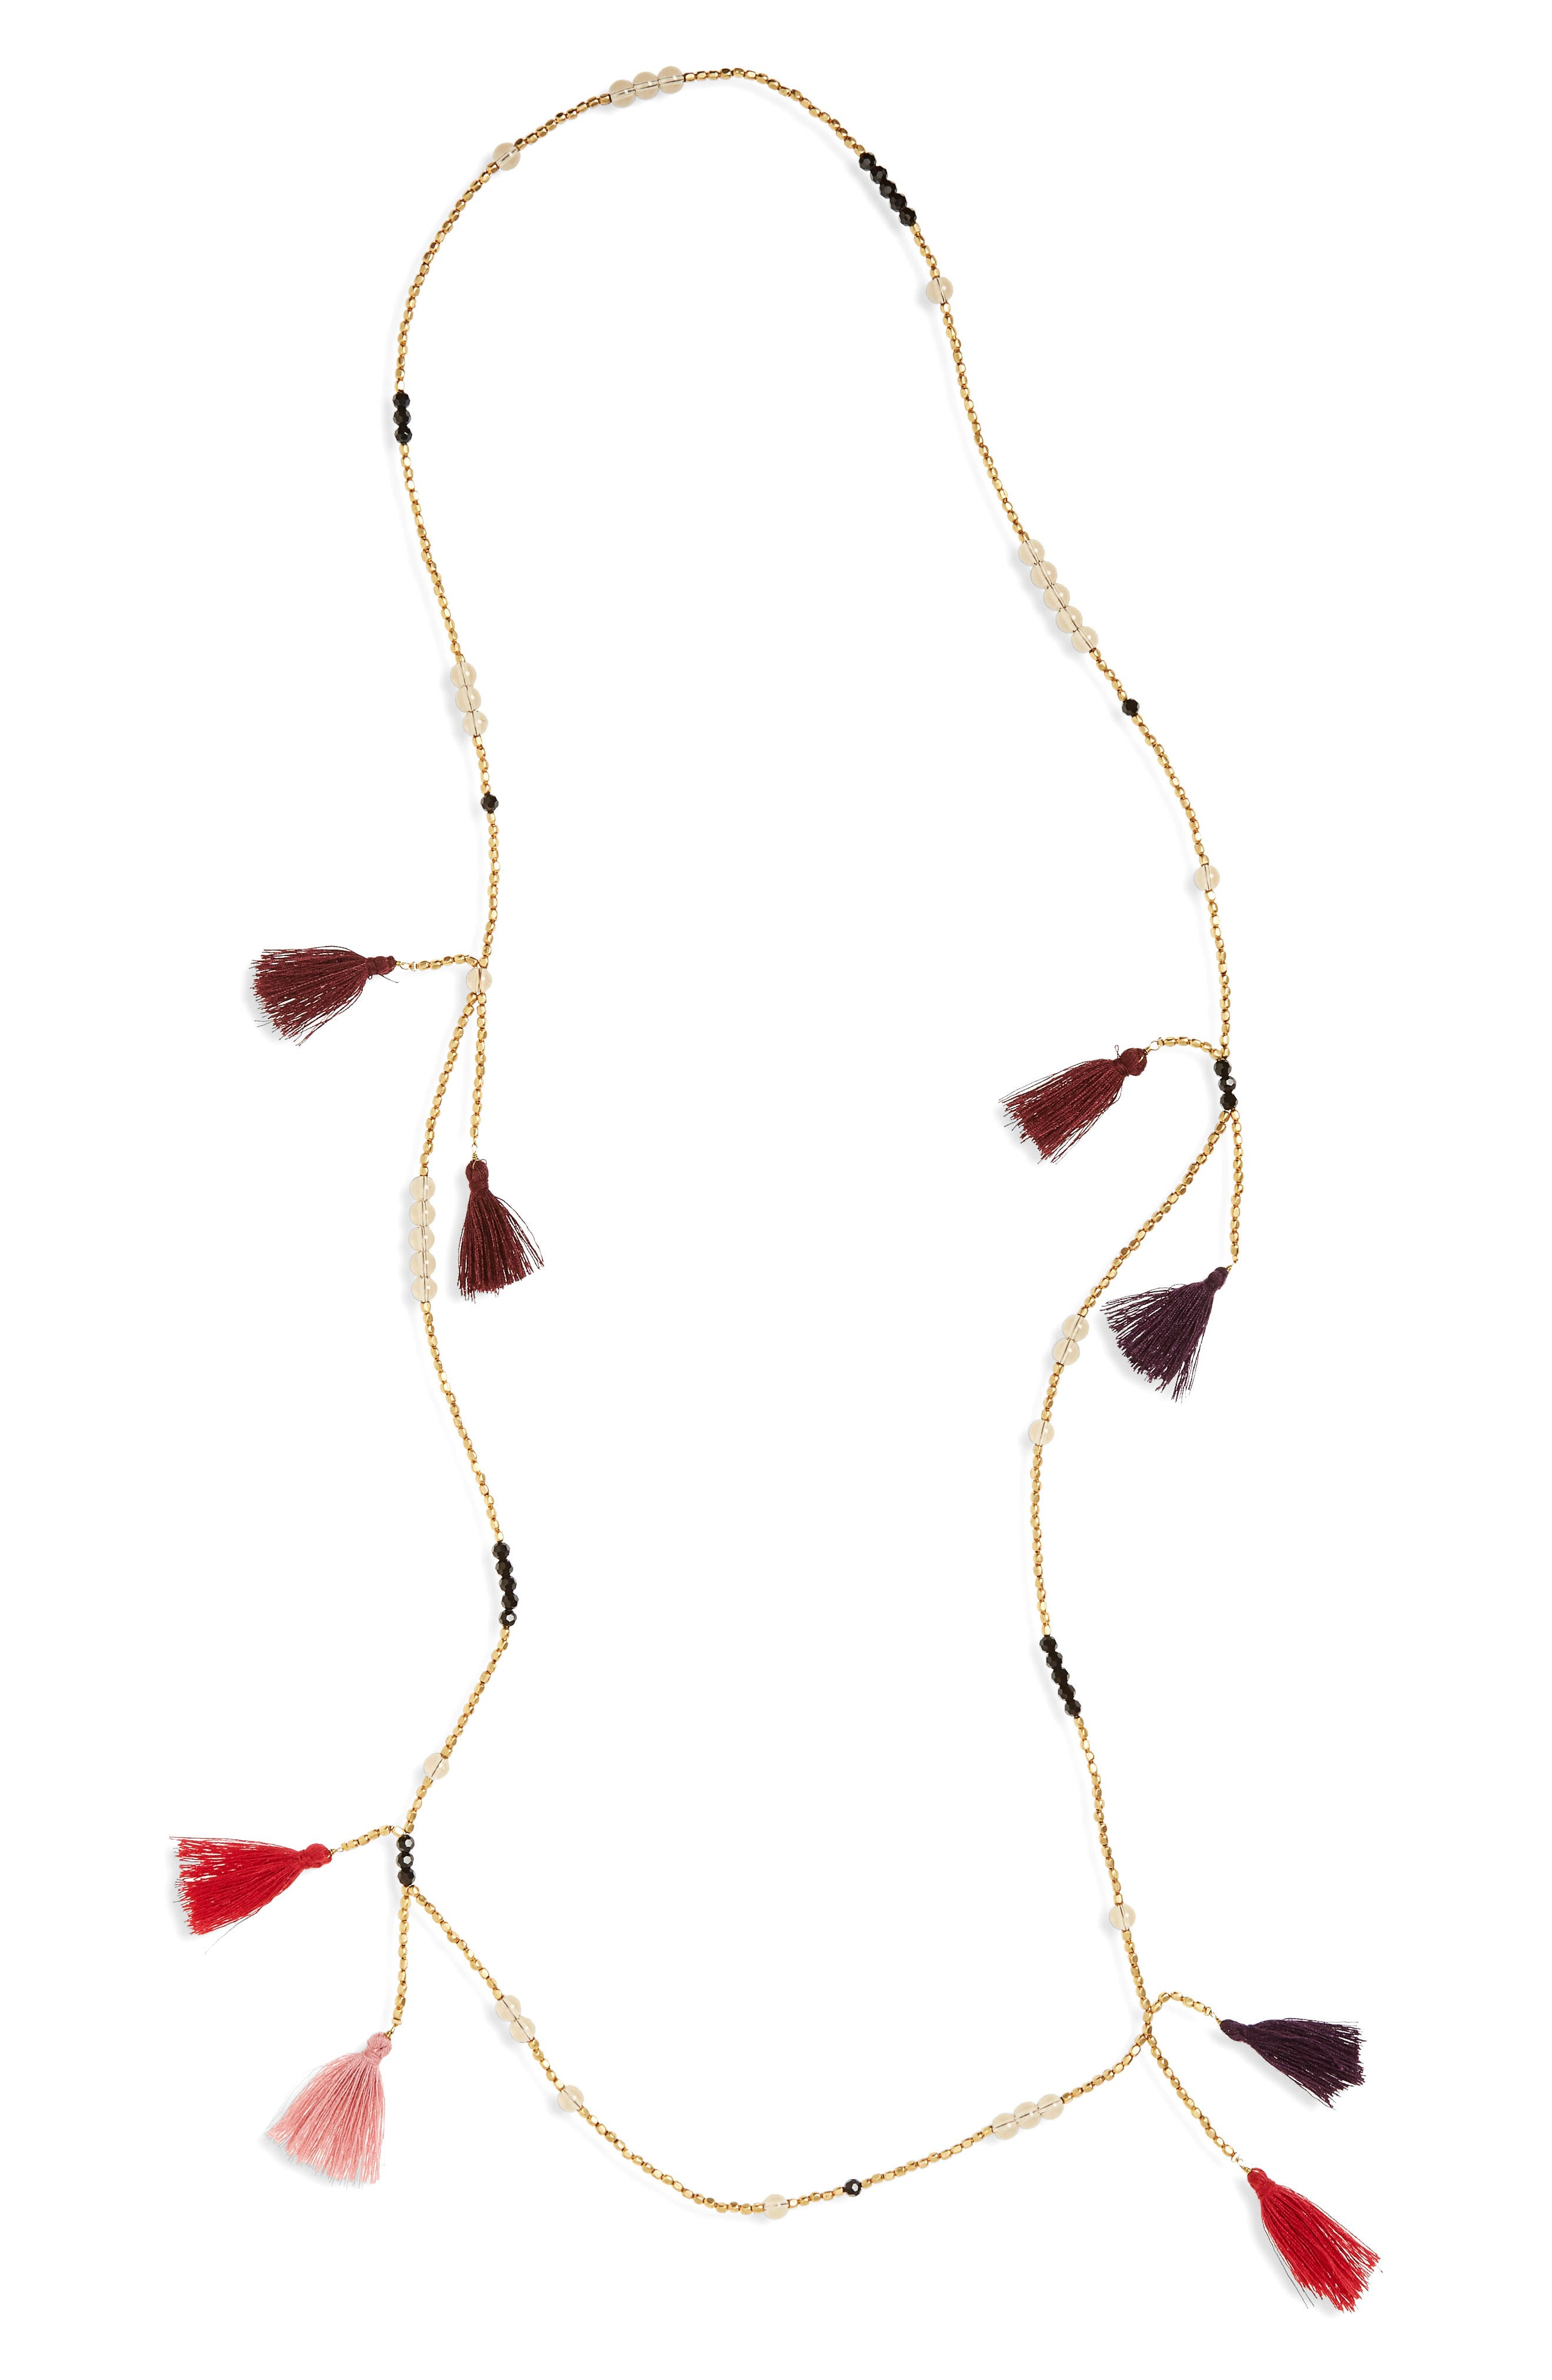 Main Image - Panacea Tassel Bead Necklace